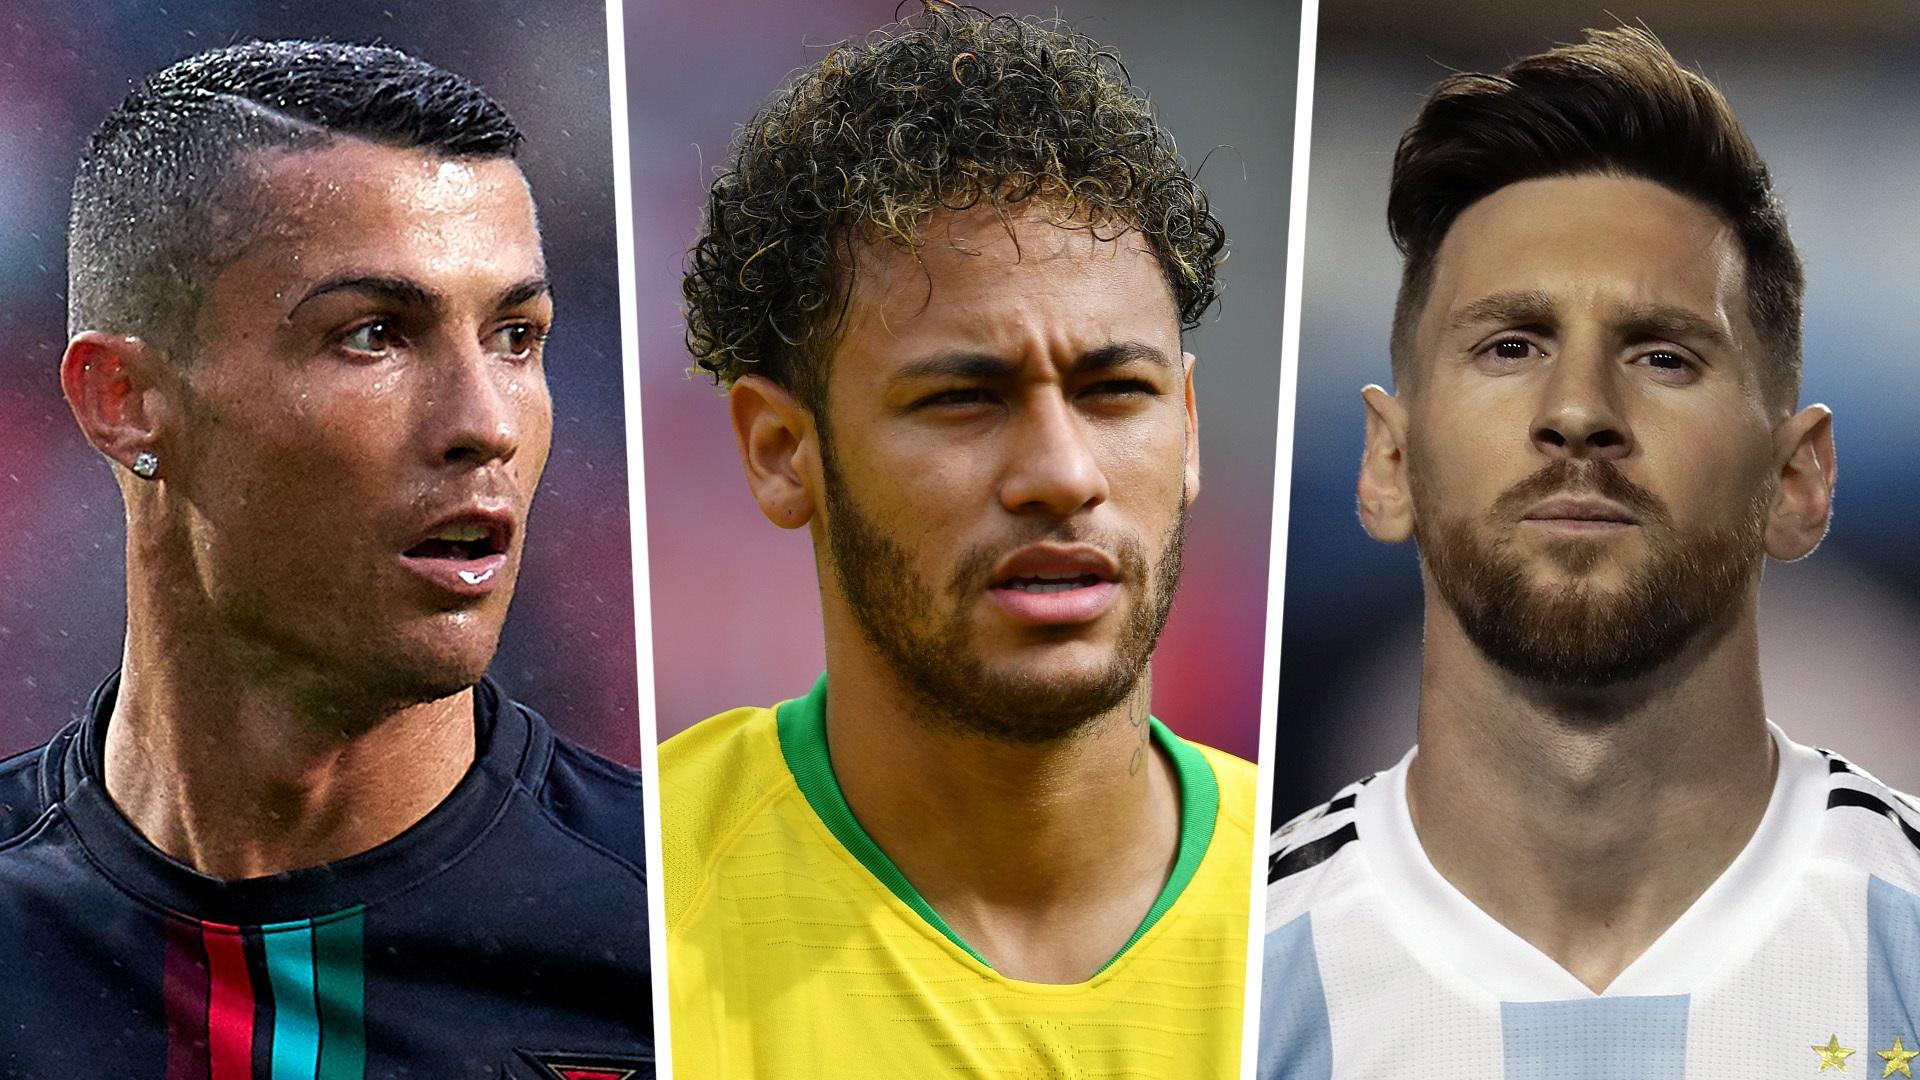 Cristiano Ronaldo Neymar Lionel Messi composite